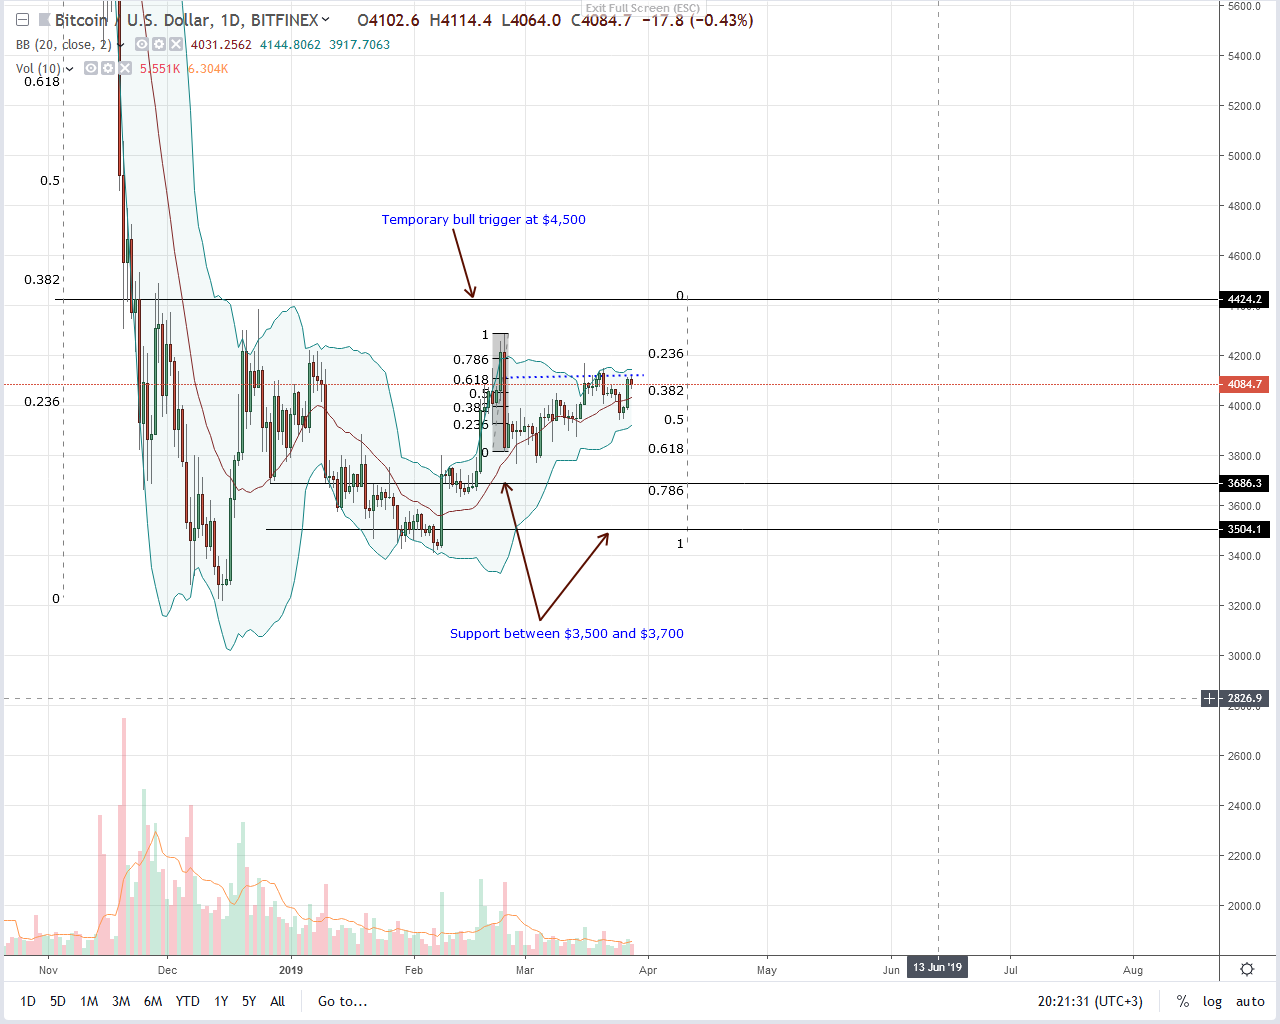 bitcoin opening price